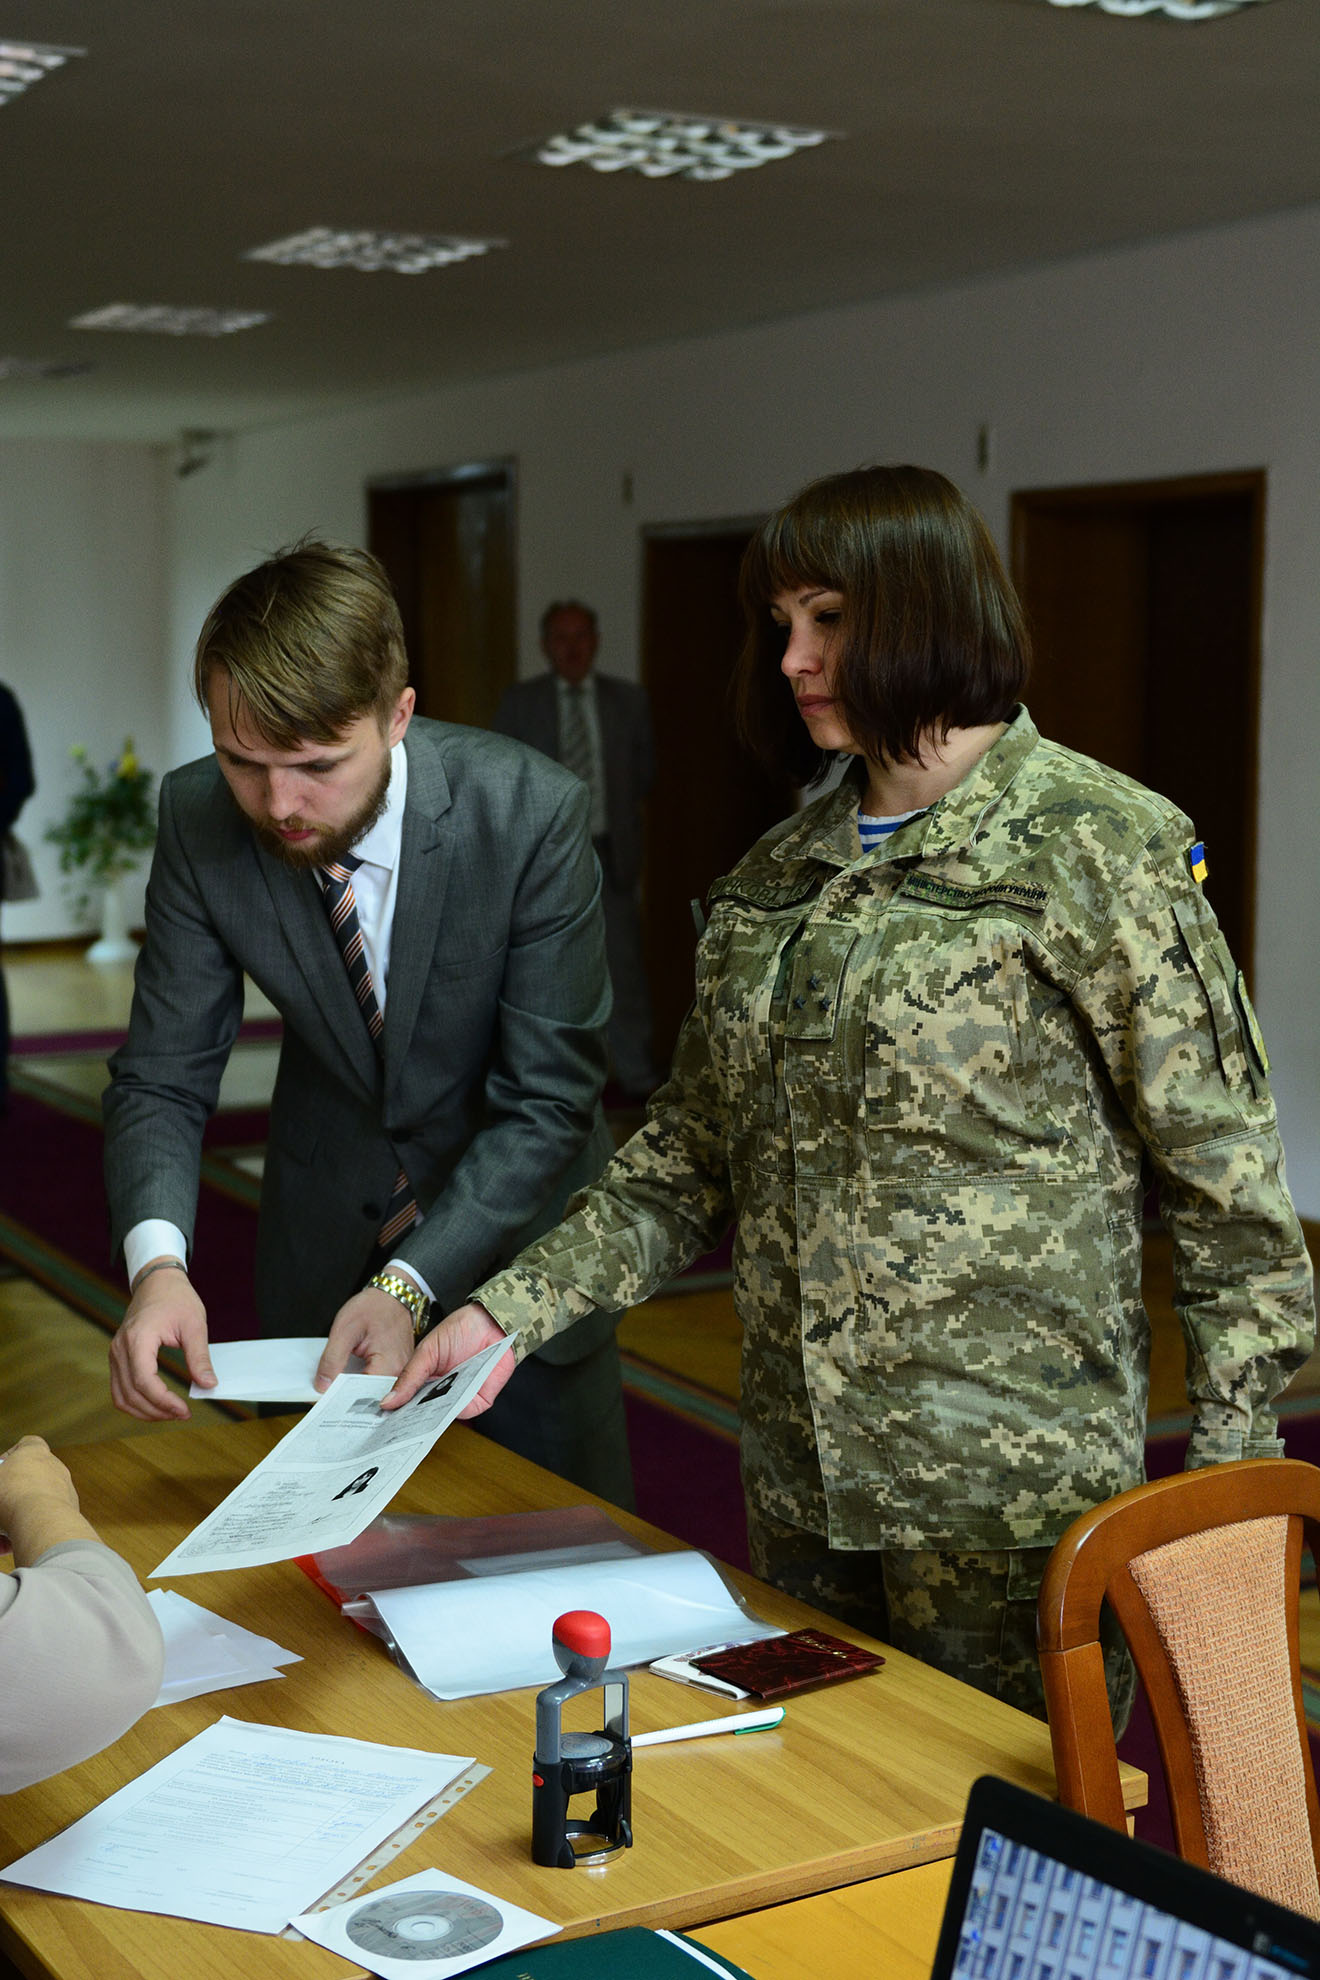 Тетяна Ричкова подала документи на реєстрацію в ЦВК - фото 2